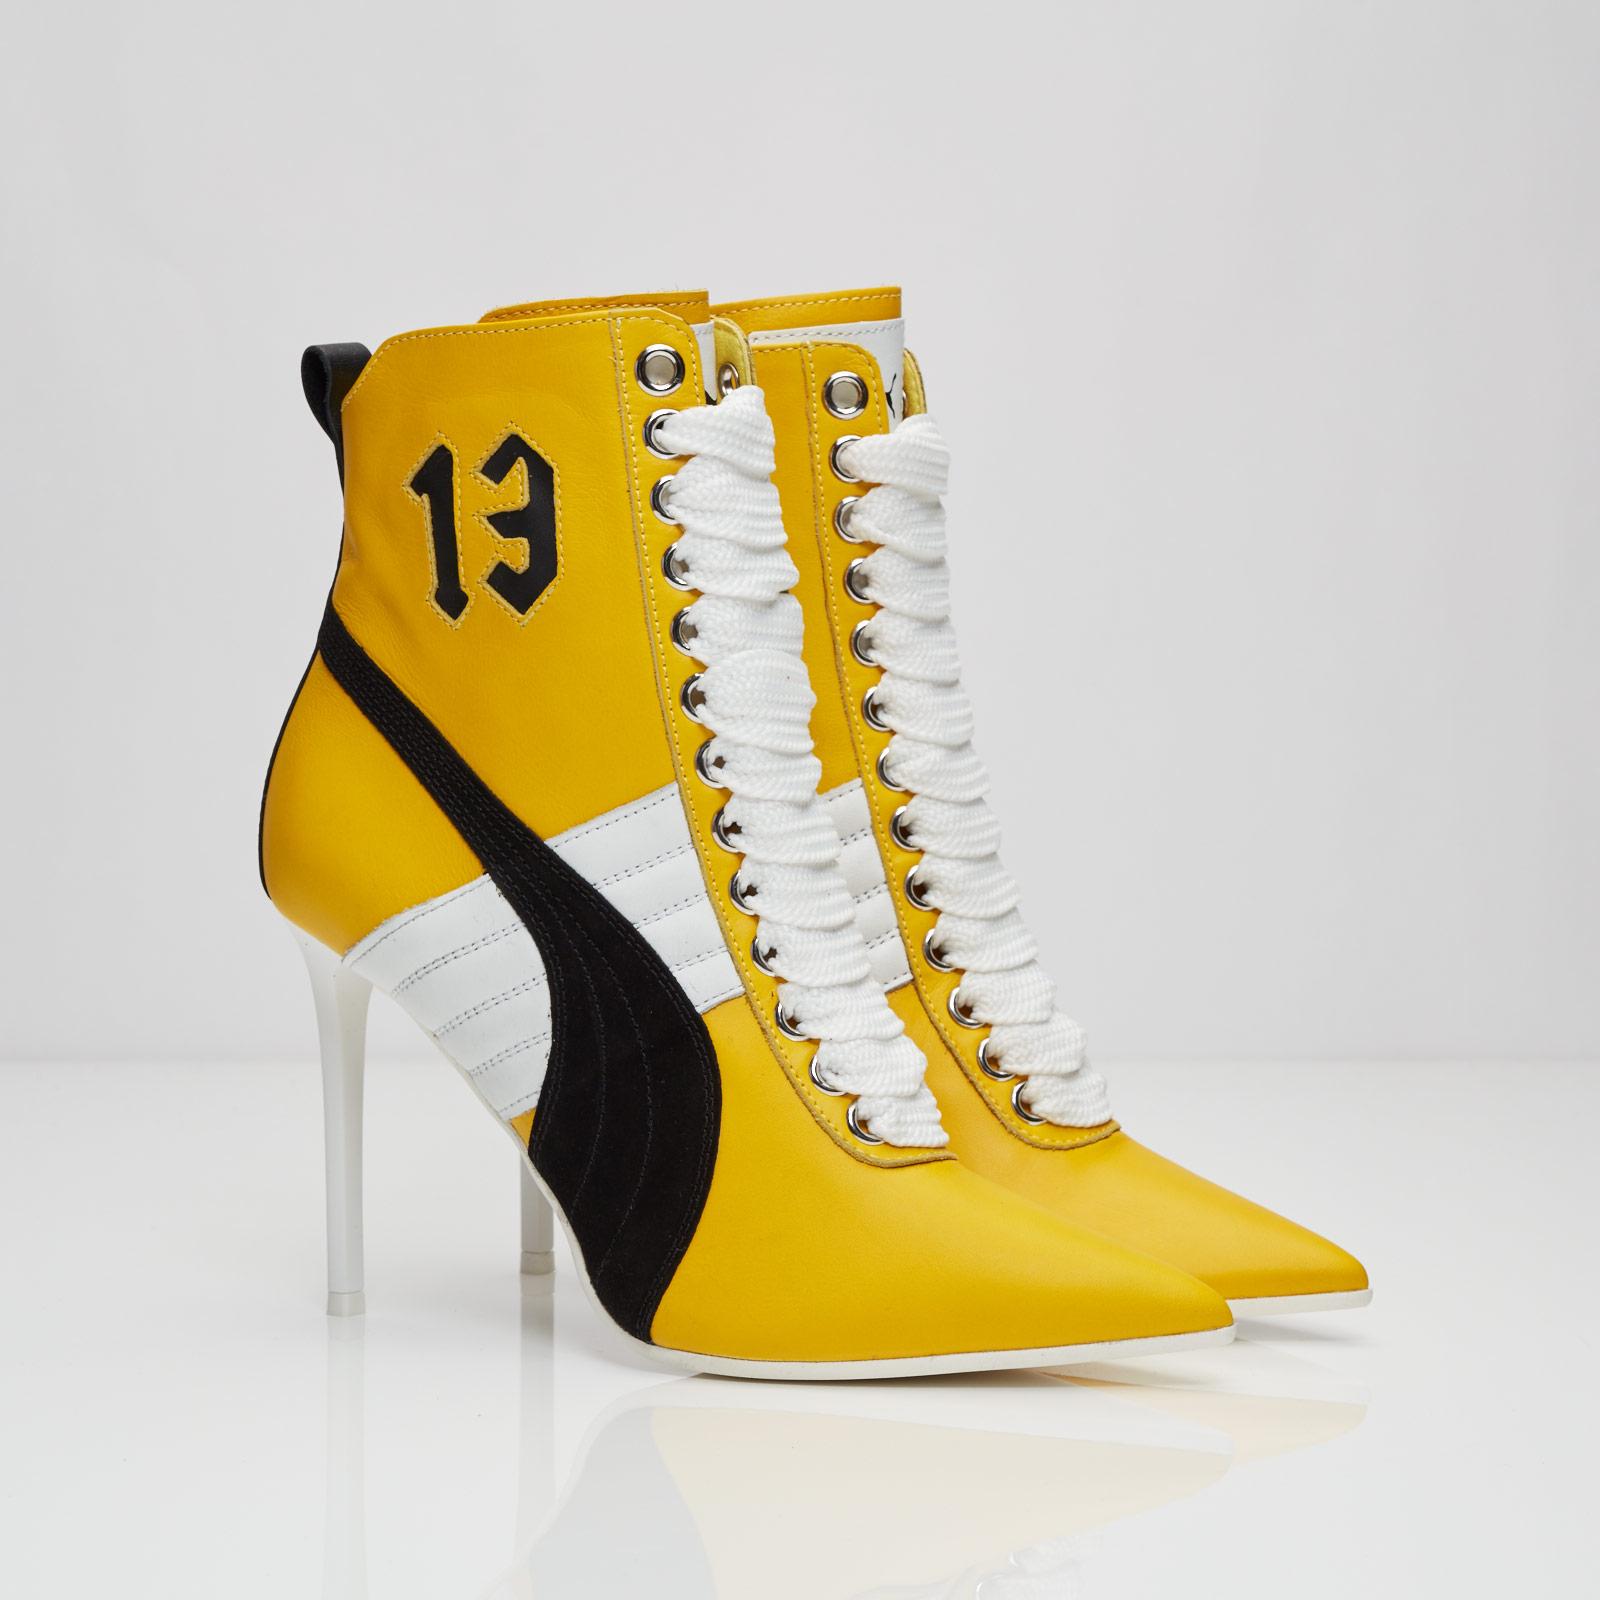 Puma High Heel Sneaker Leather - 363038